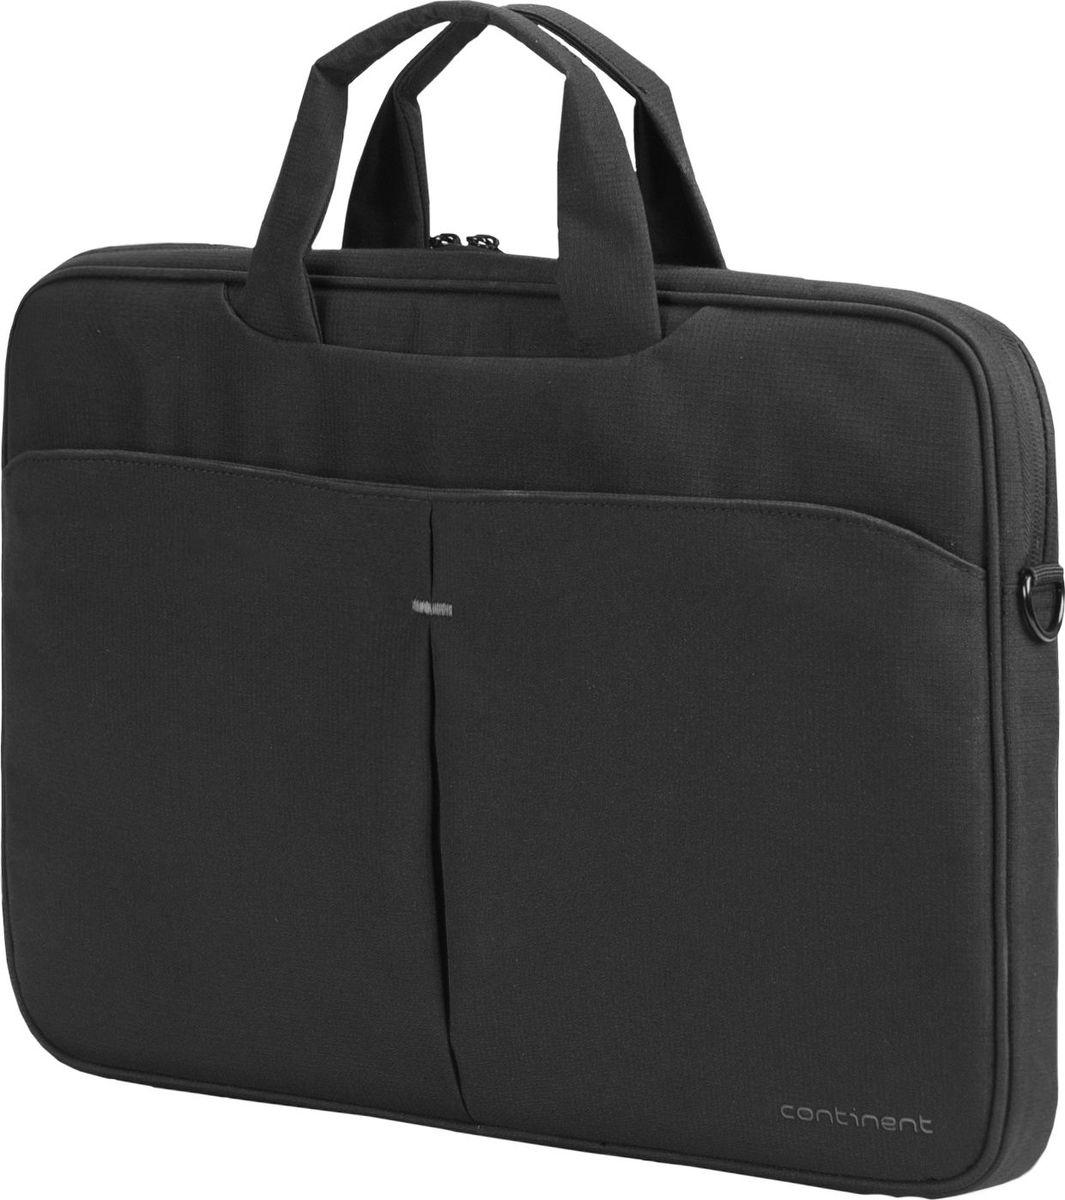 Continent CC-012, Black сумка для ноутбука 15.600-5000353Сумка для ноутбука с диагональю до 15.6